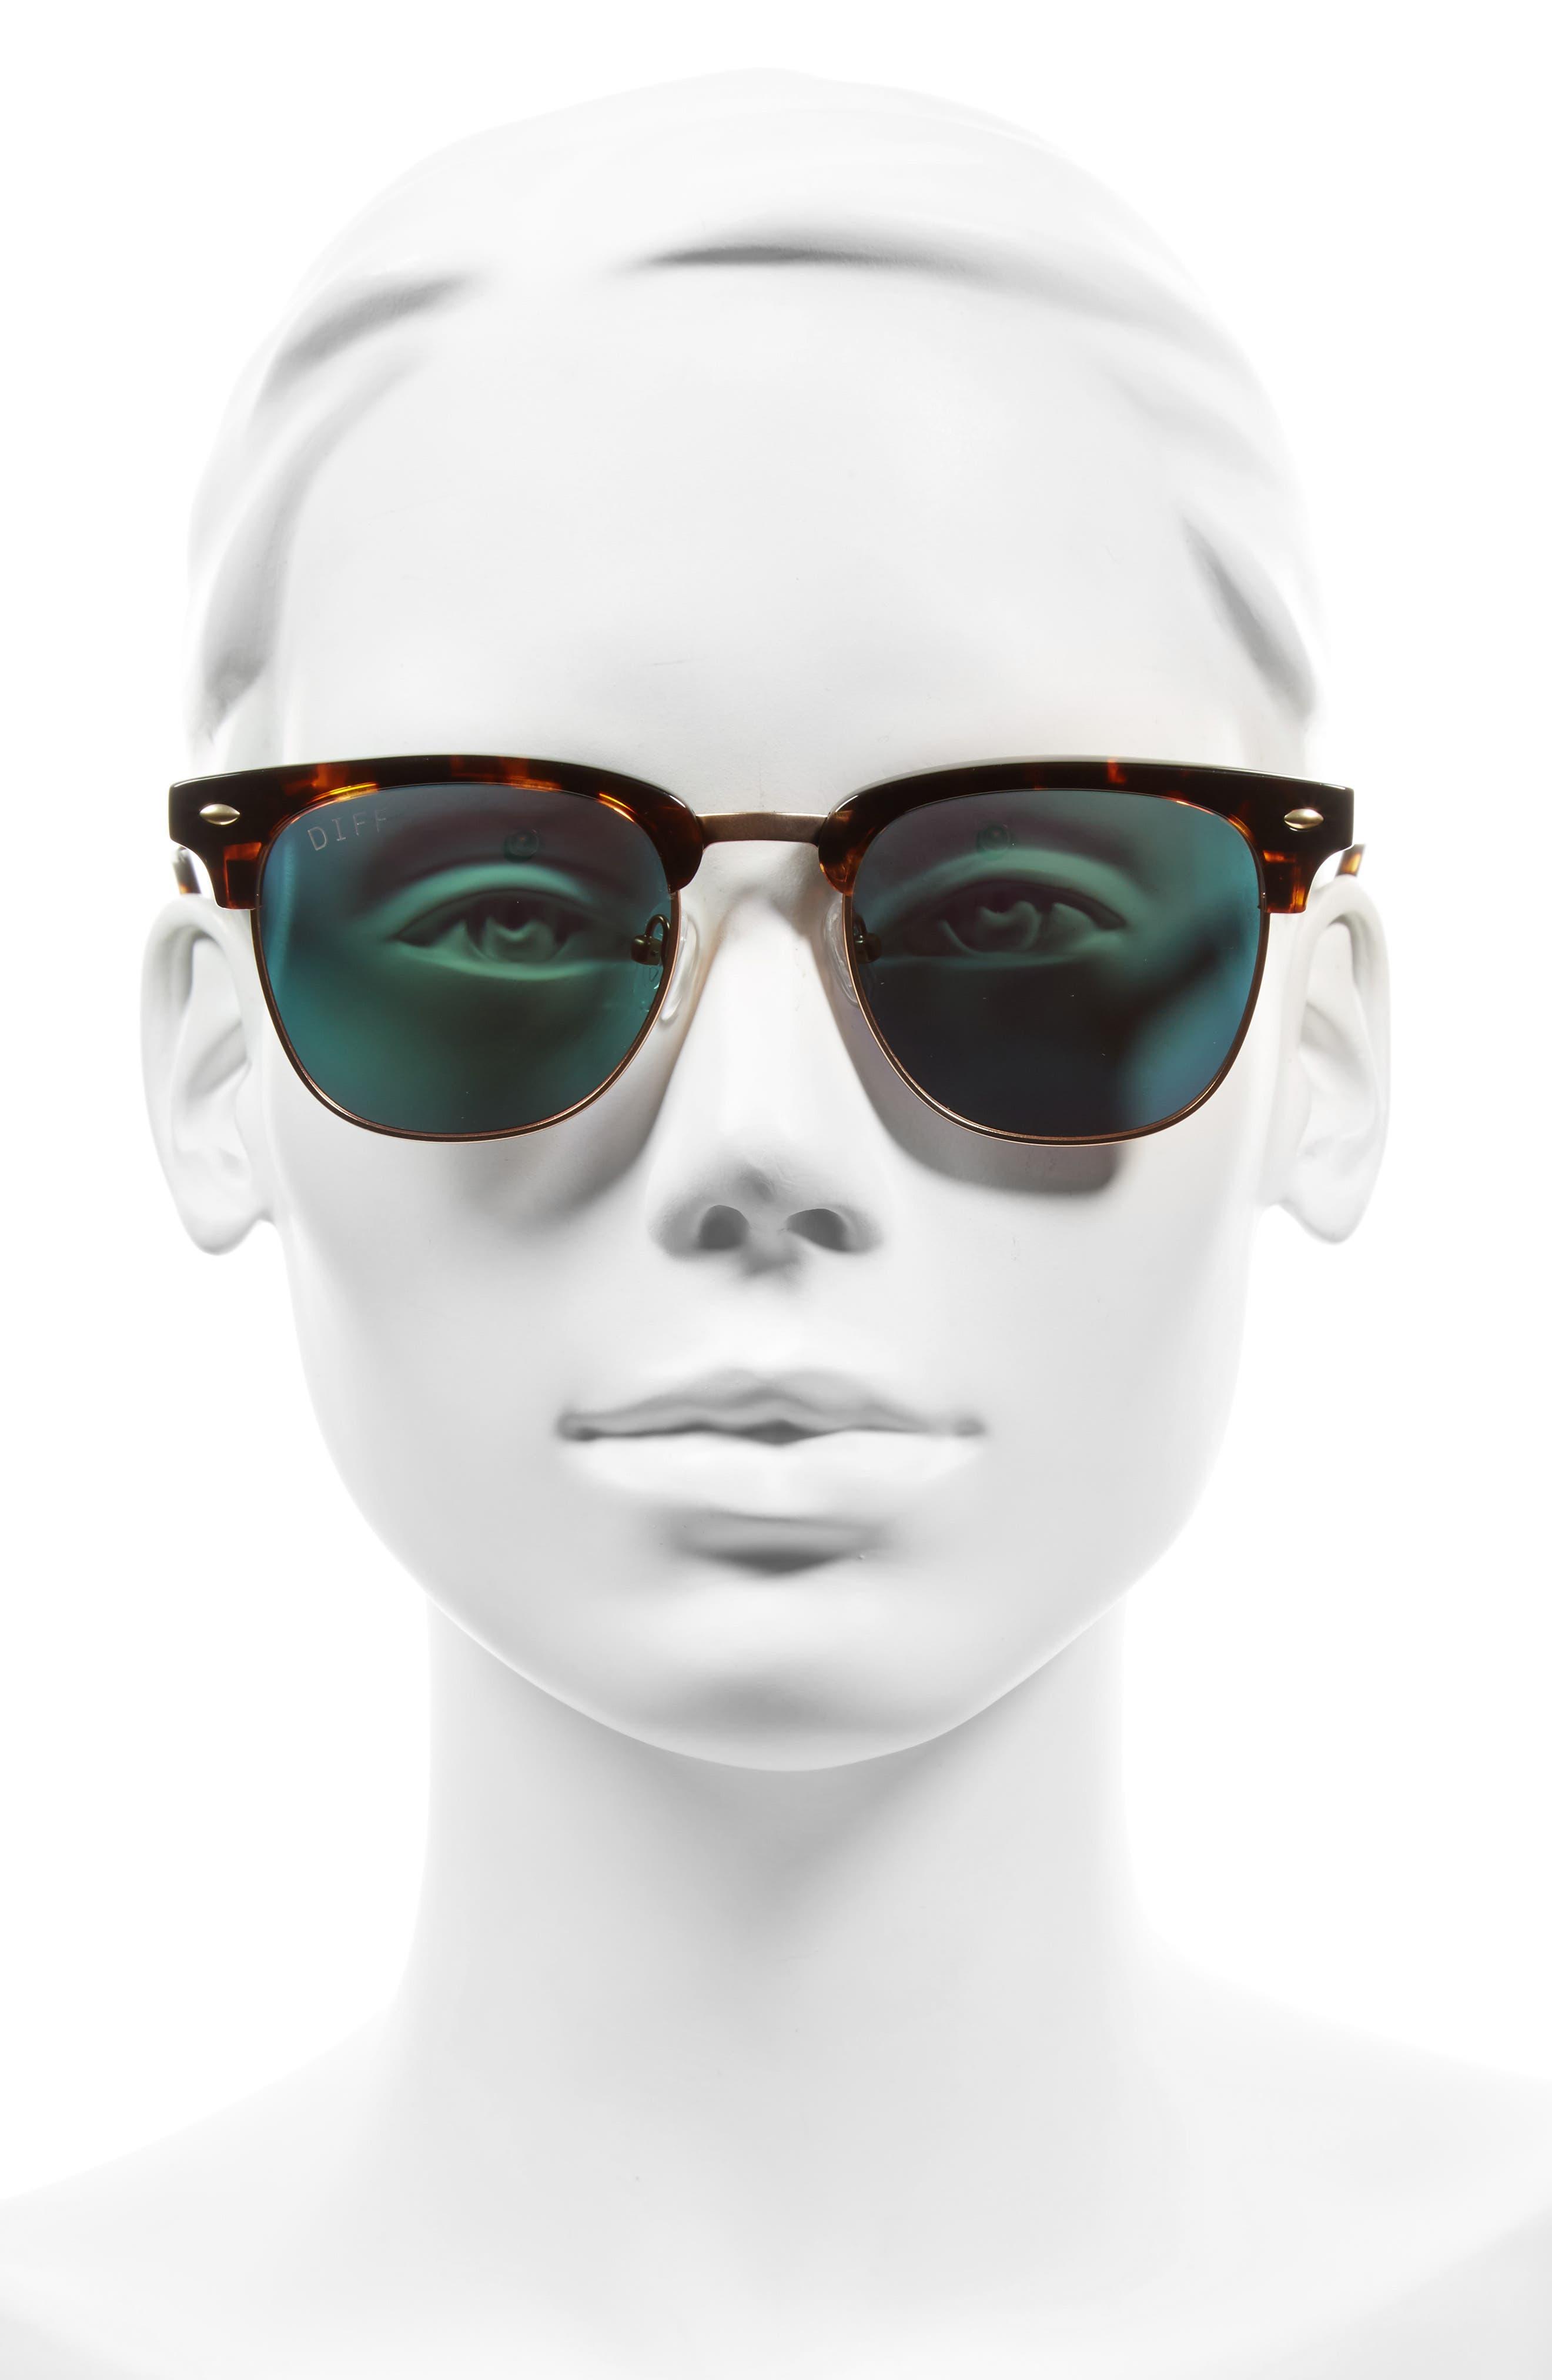 Barry 51mm Polarized Retro Sunglasses,                             Alternate thumbnail 12, color,